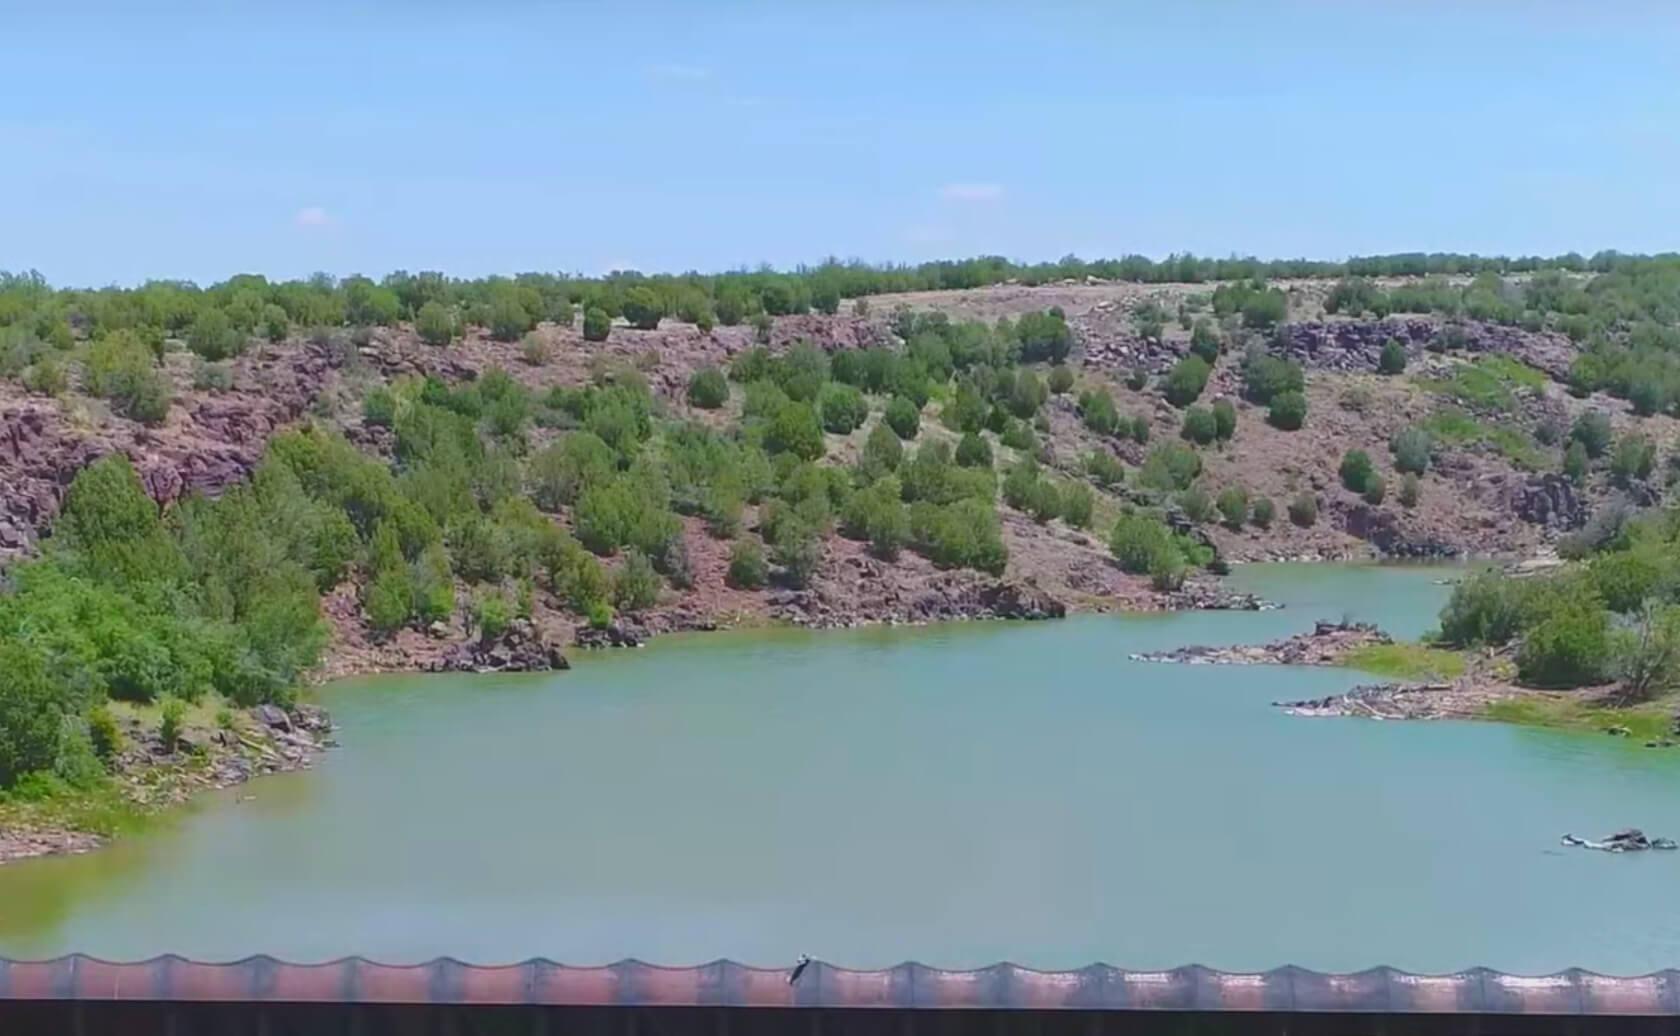 Ash-Fork-Stone-Dam-Lake-fishing-guide-report-Ash-Fork-AZ-03